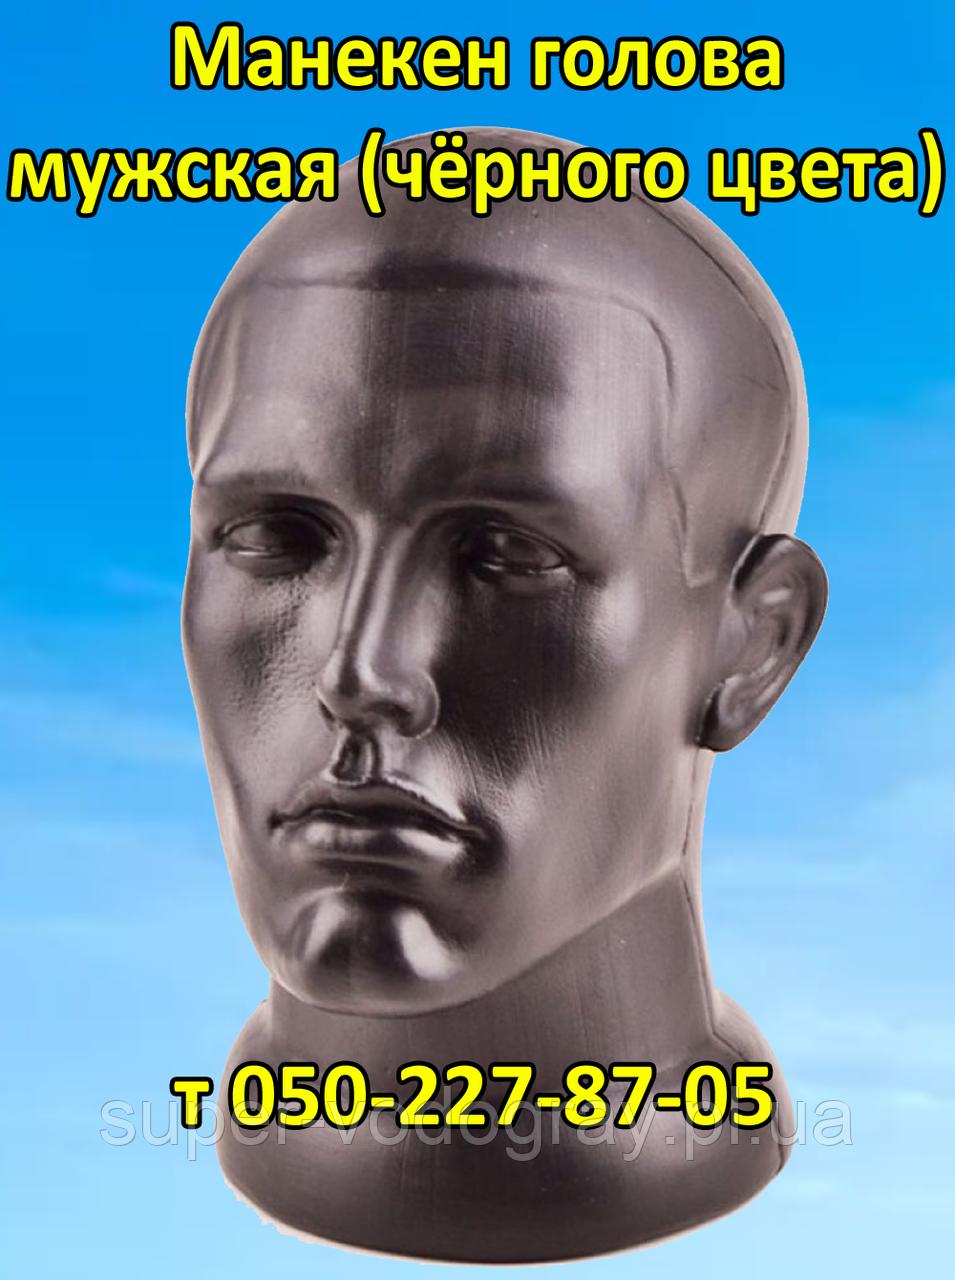 Манекен голова мужская (цвет - чёрный)